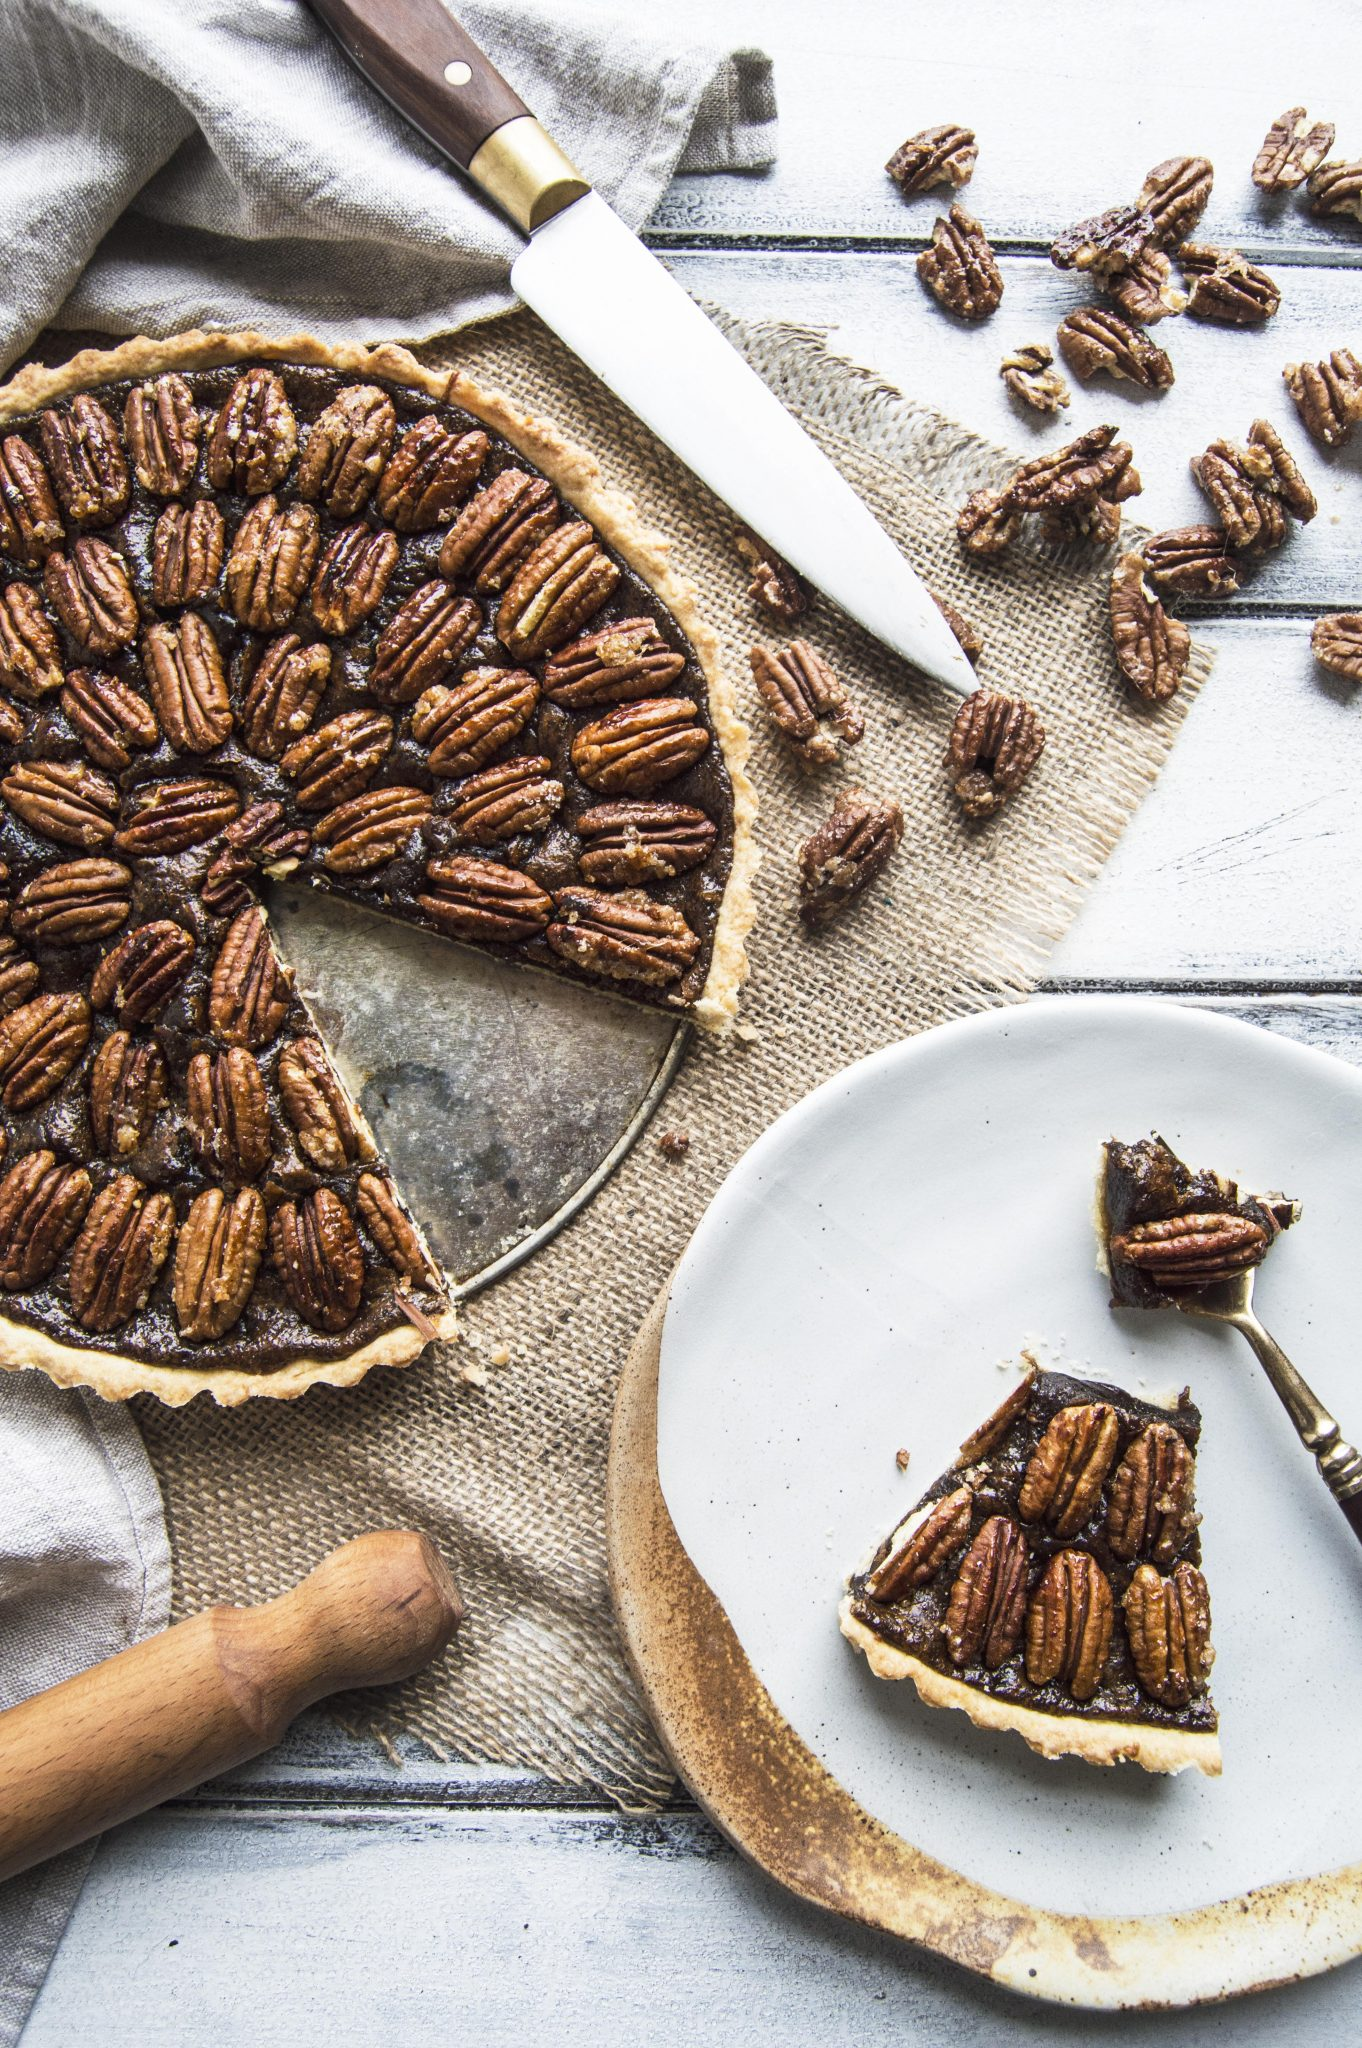 A Very Vegan Christmas – 5 Recipes To Make Over The Holidays